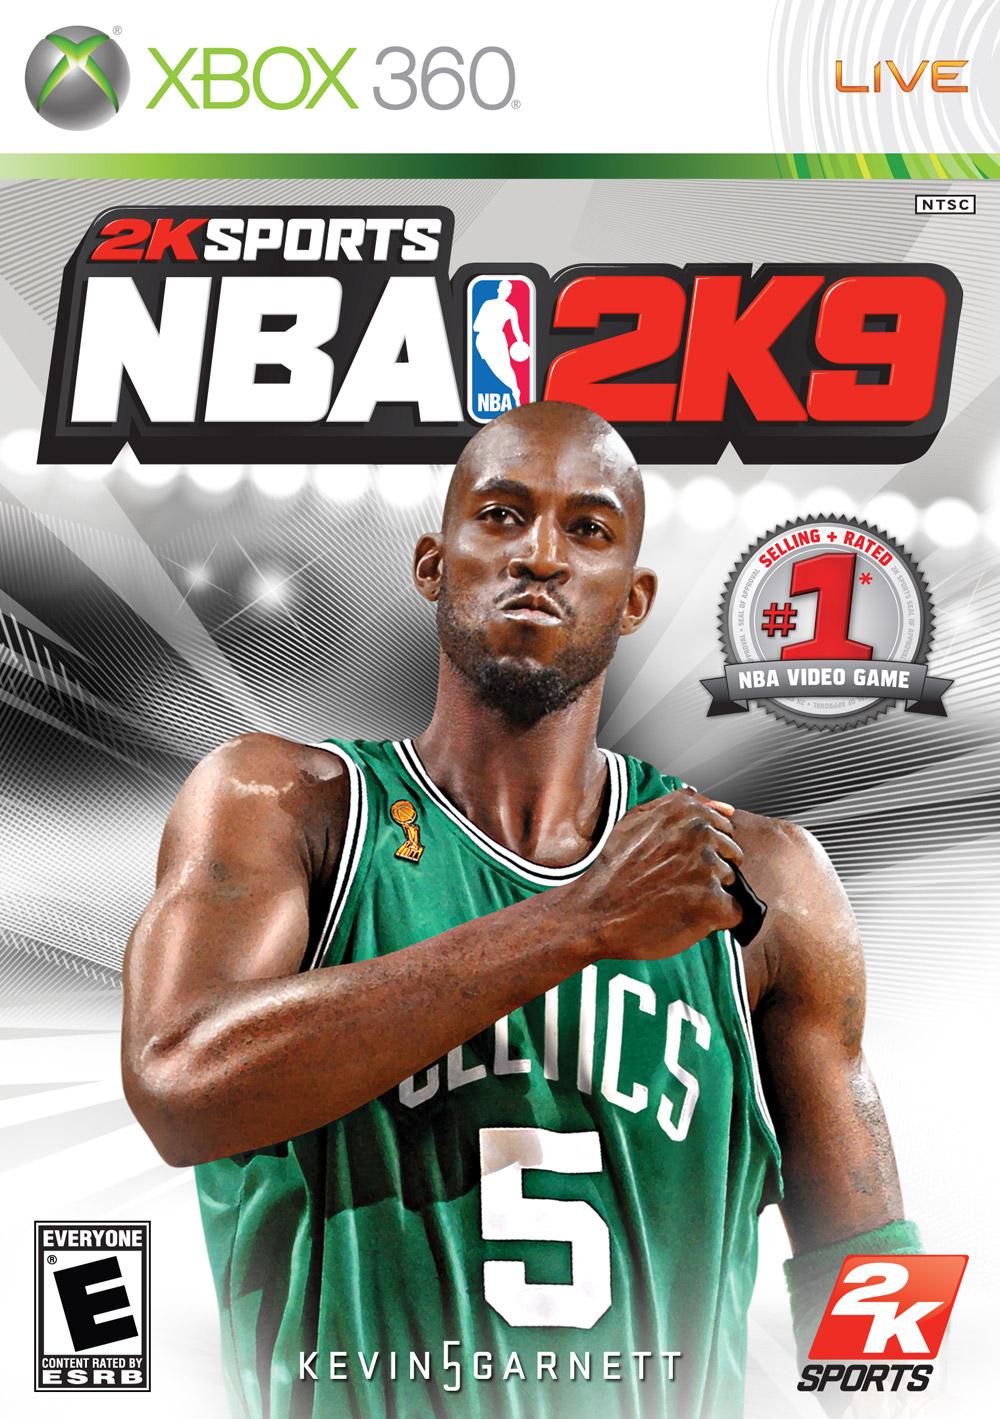 Nba 2k9 Xbox 360 Game